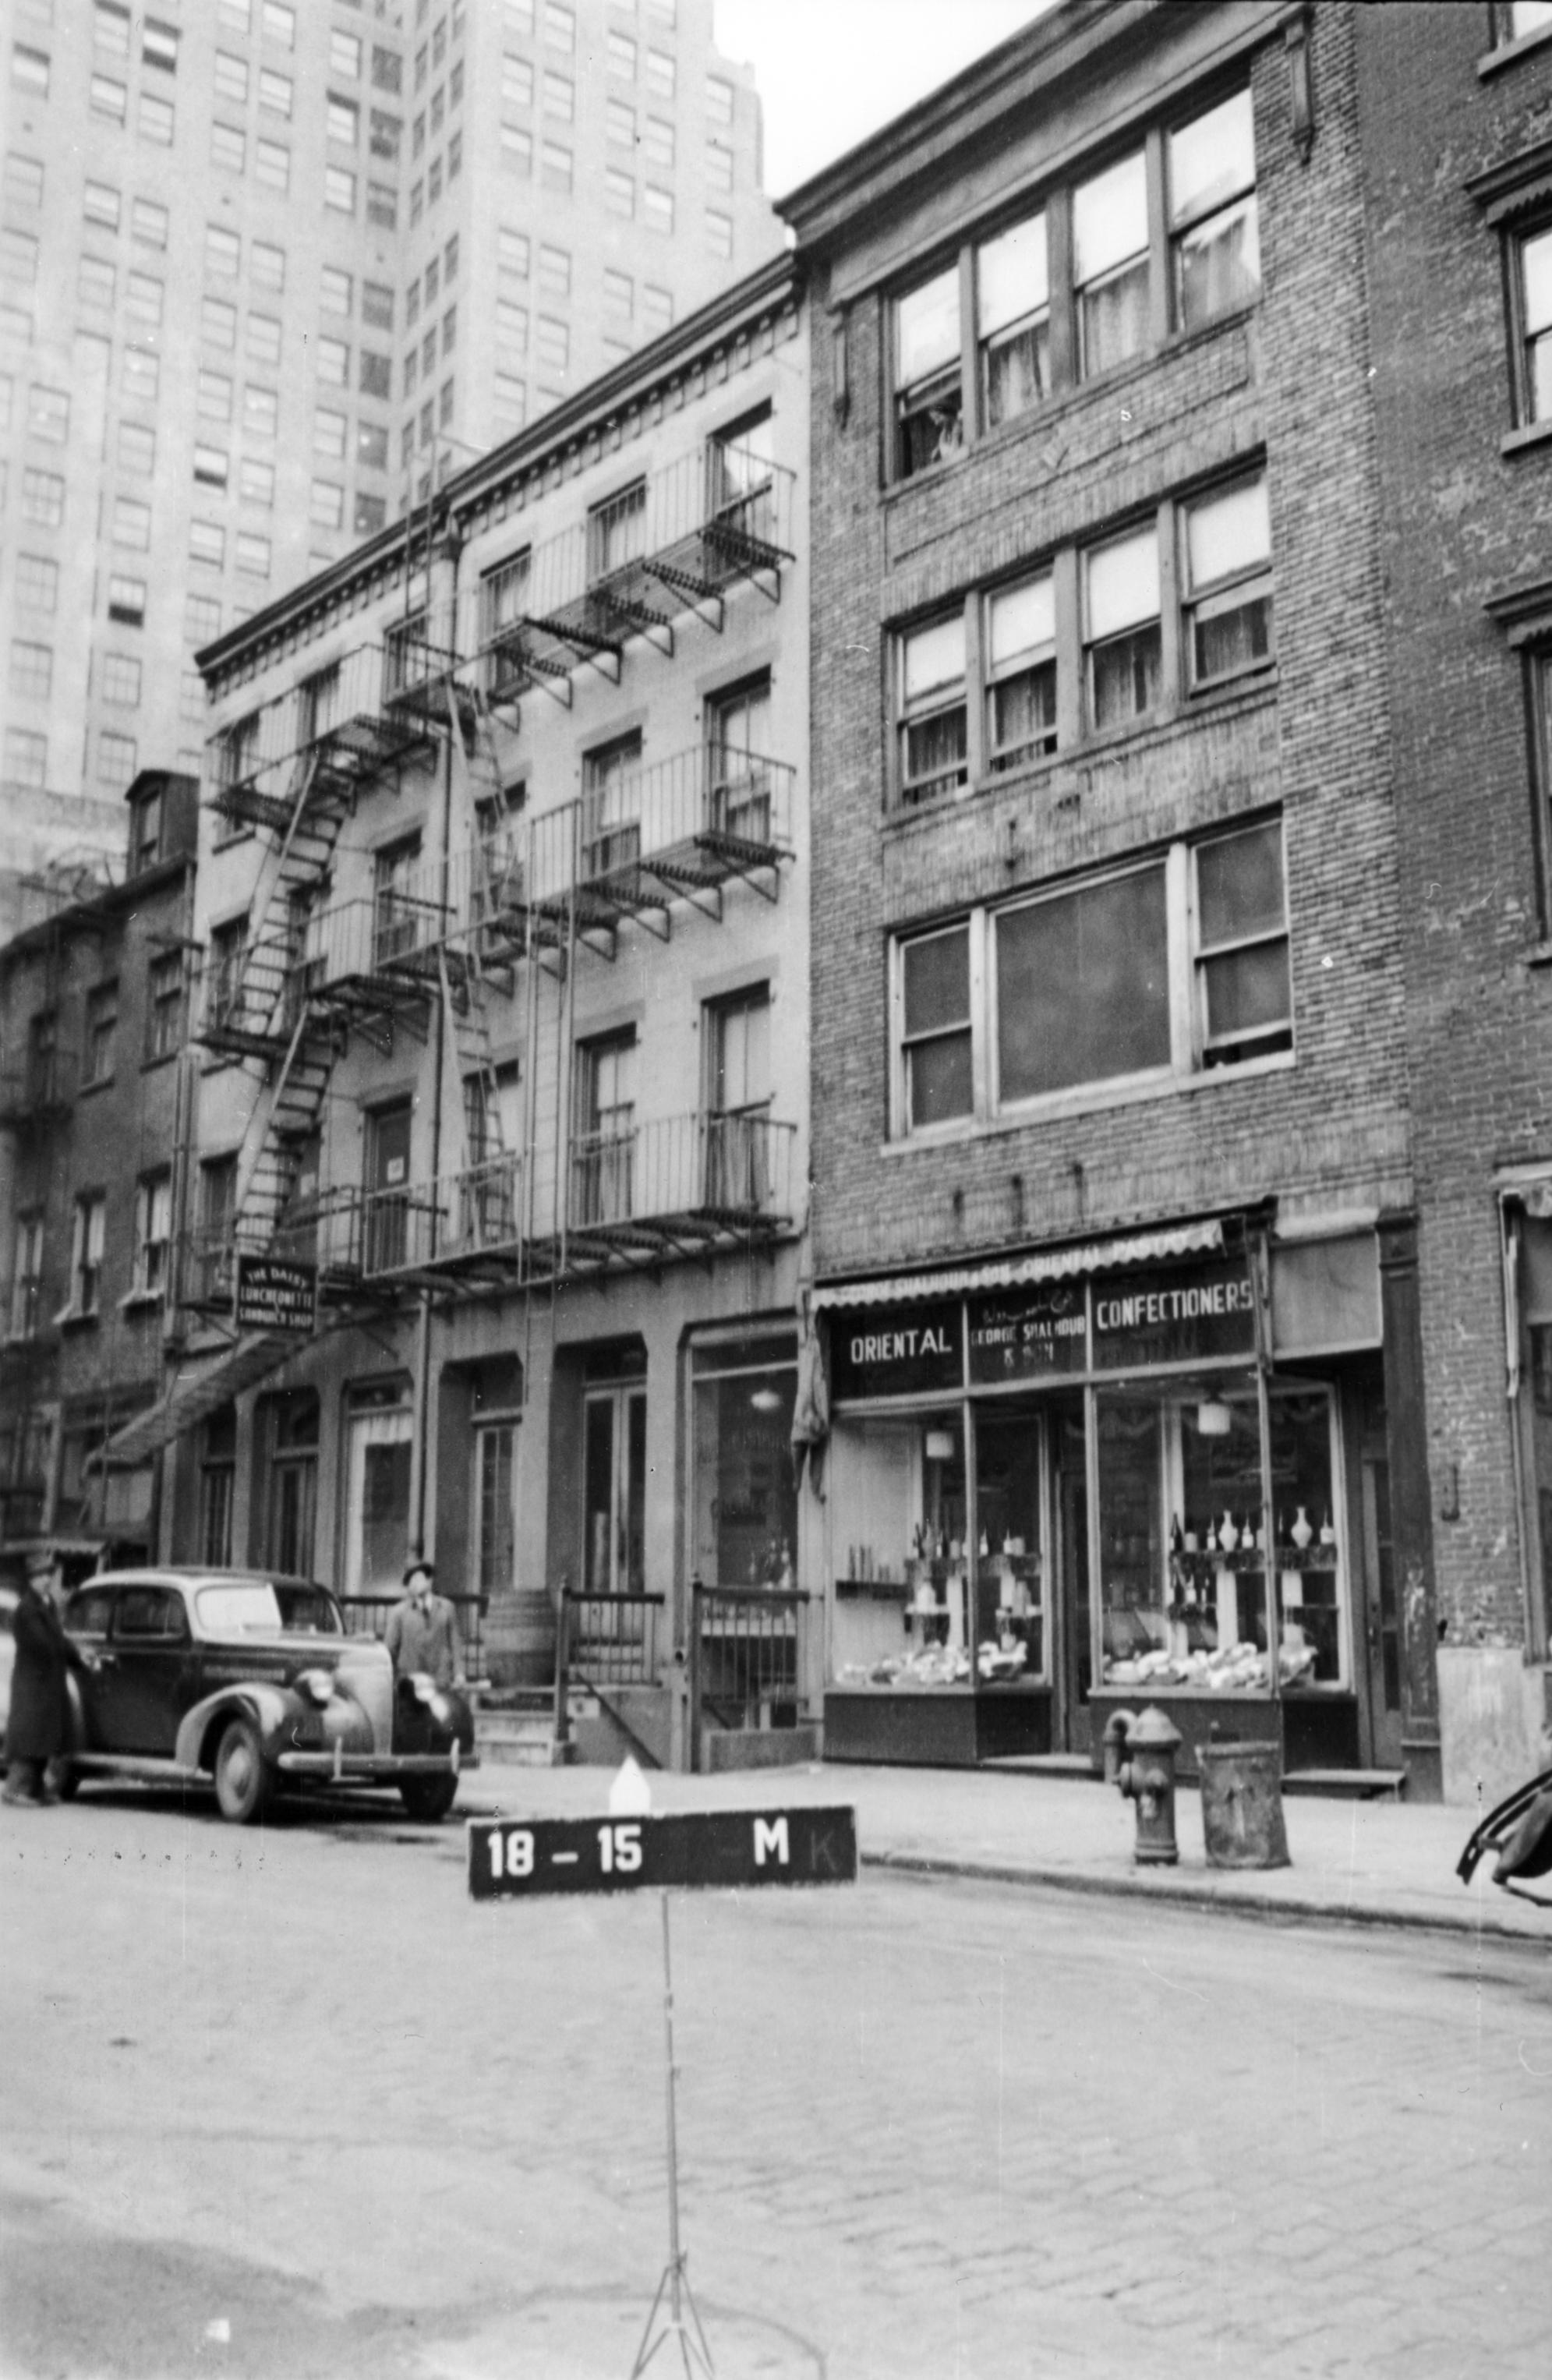 67 Washington Street, ca. 1939